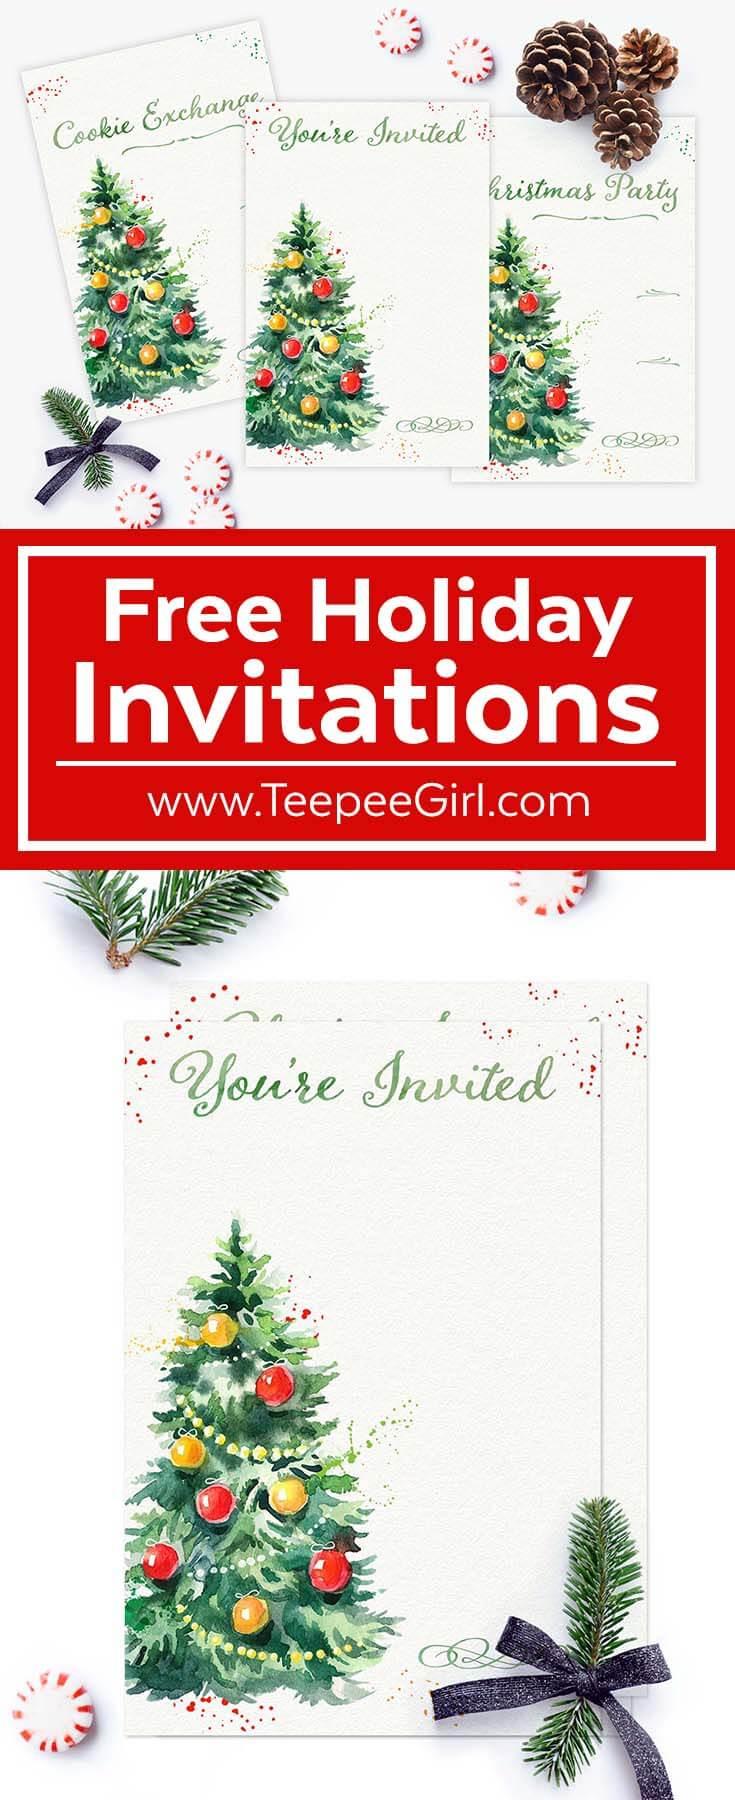 Free Holiday Invitations Teepee Girl – Free Christmas Party Invitation